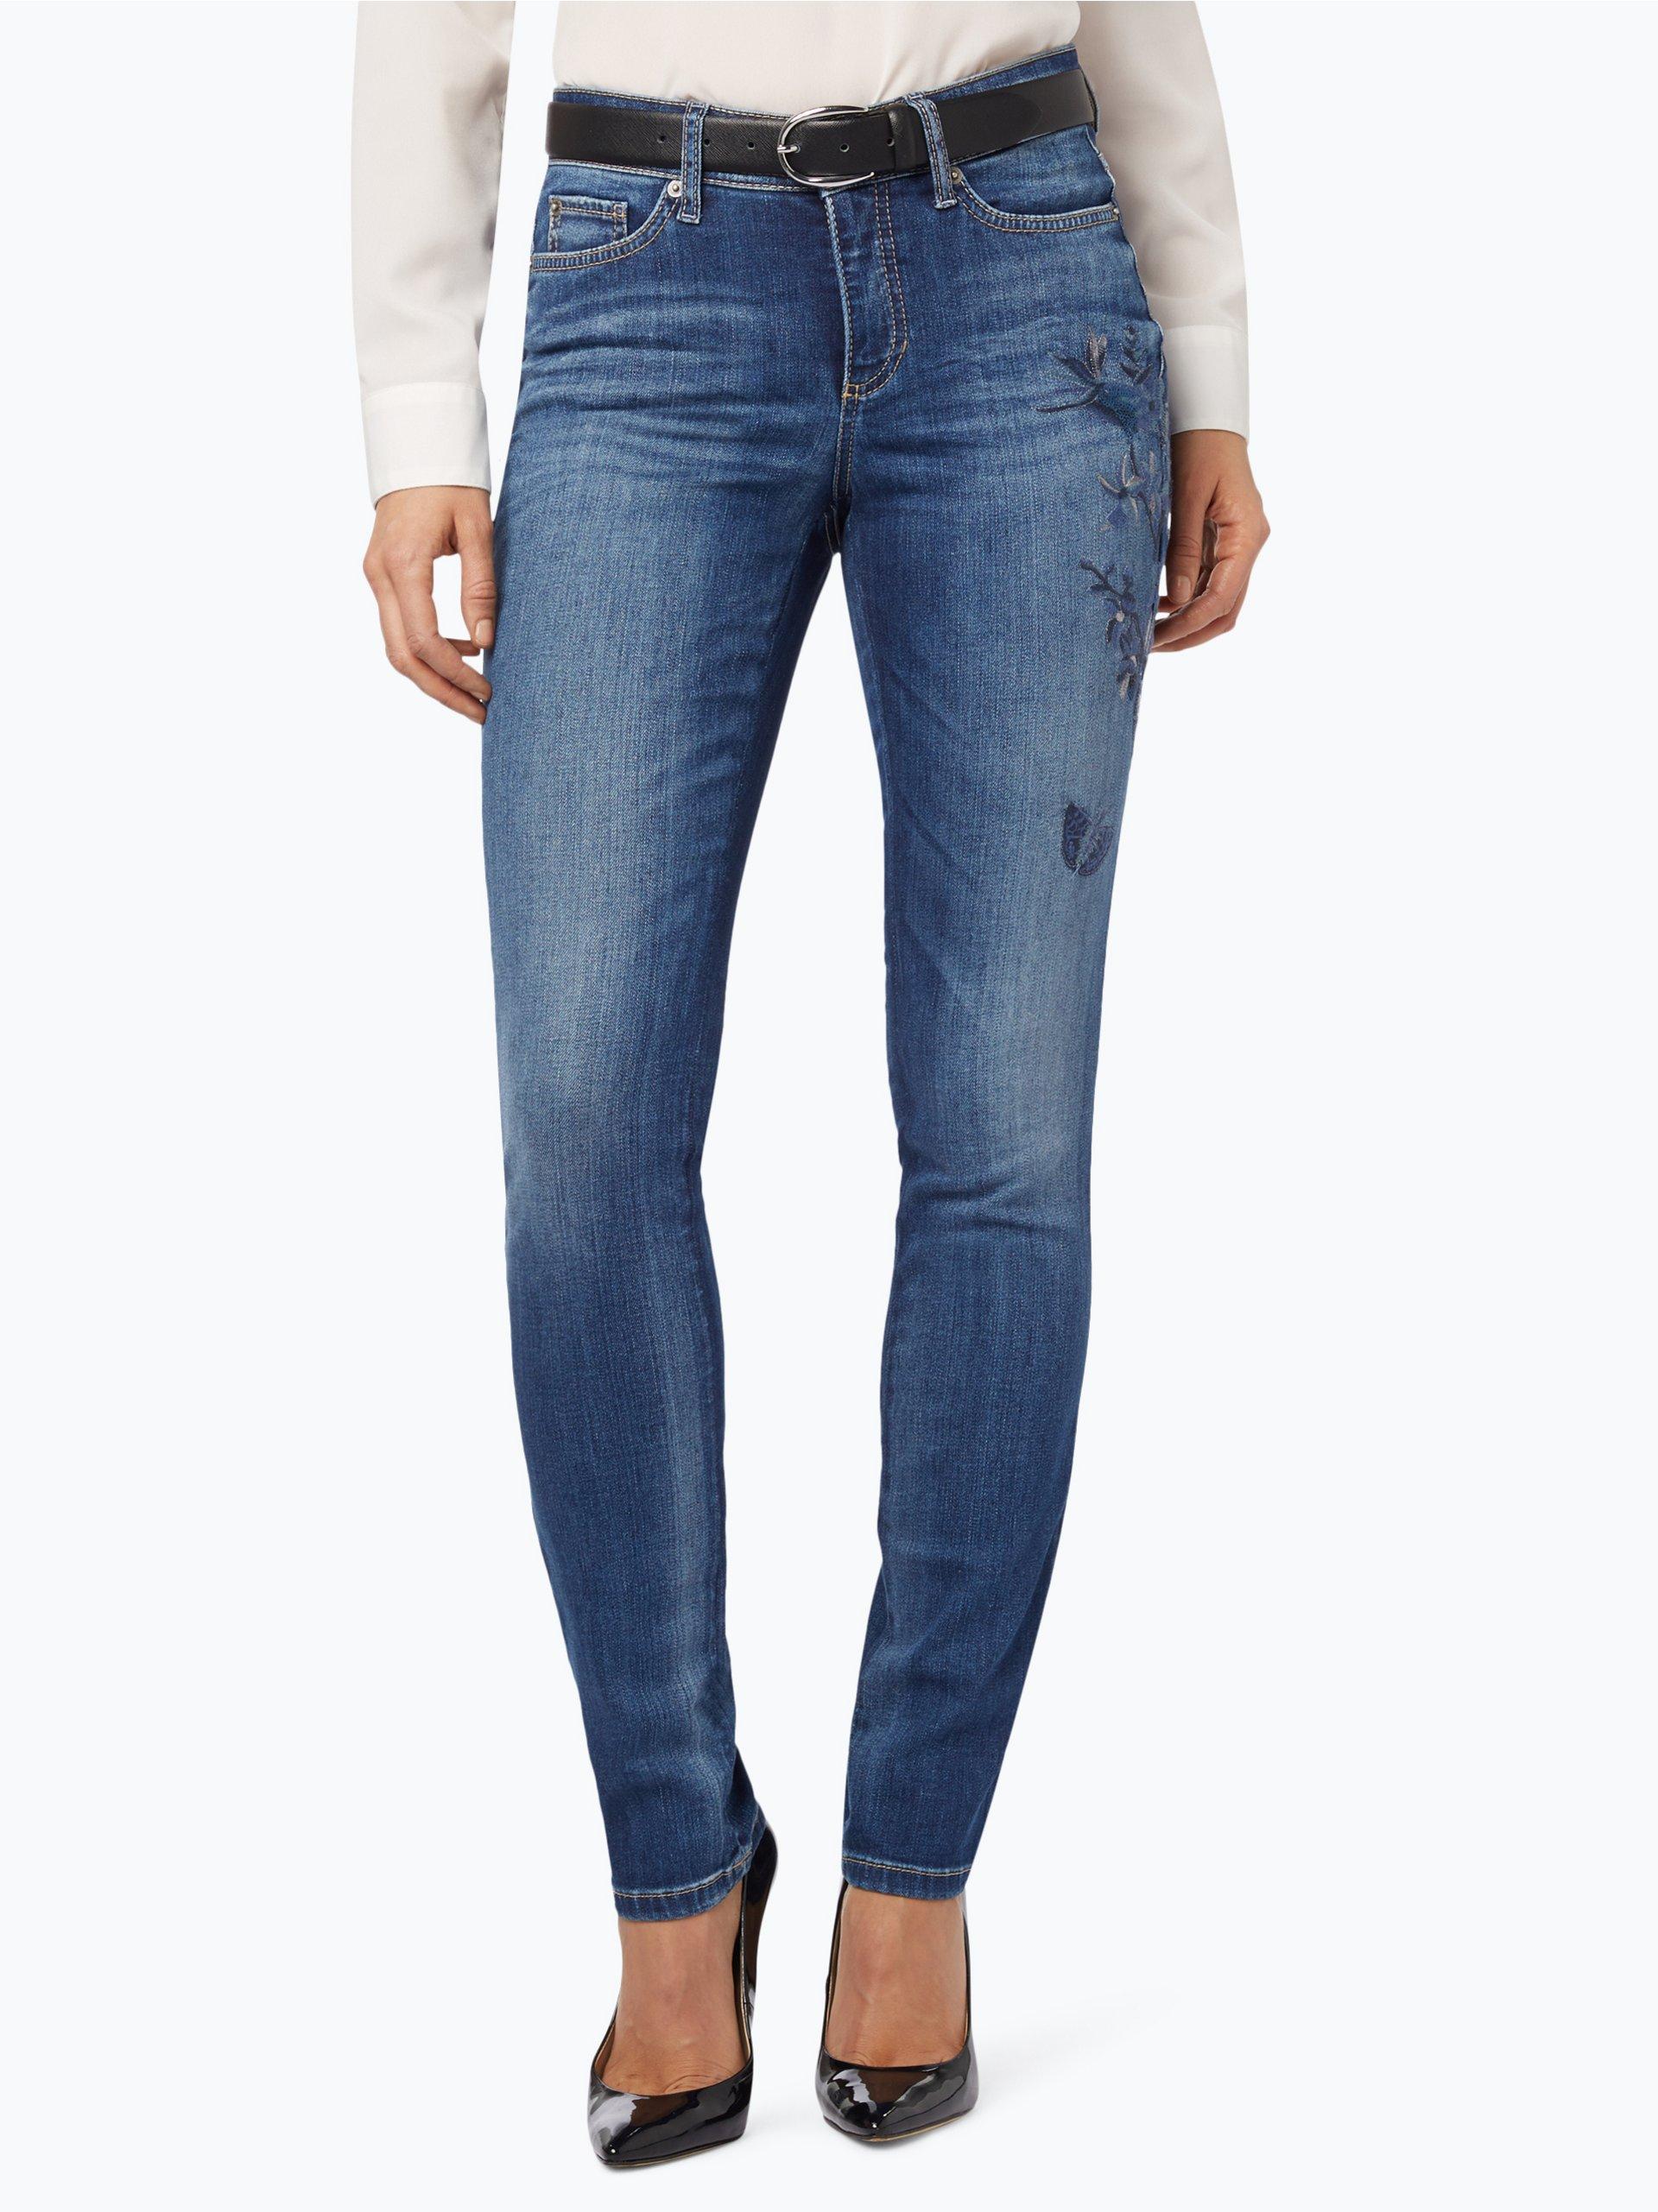 cambio damen jeans parla blue stone gemustert online kaufen vangraaf com. Black Bedroom Furniture Sets. Home Design Ideas